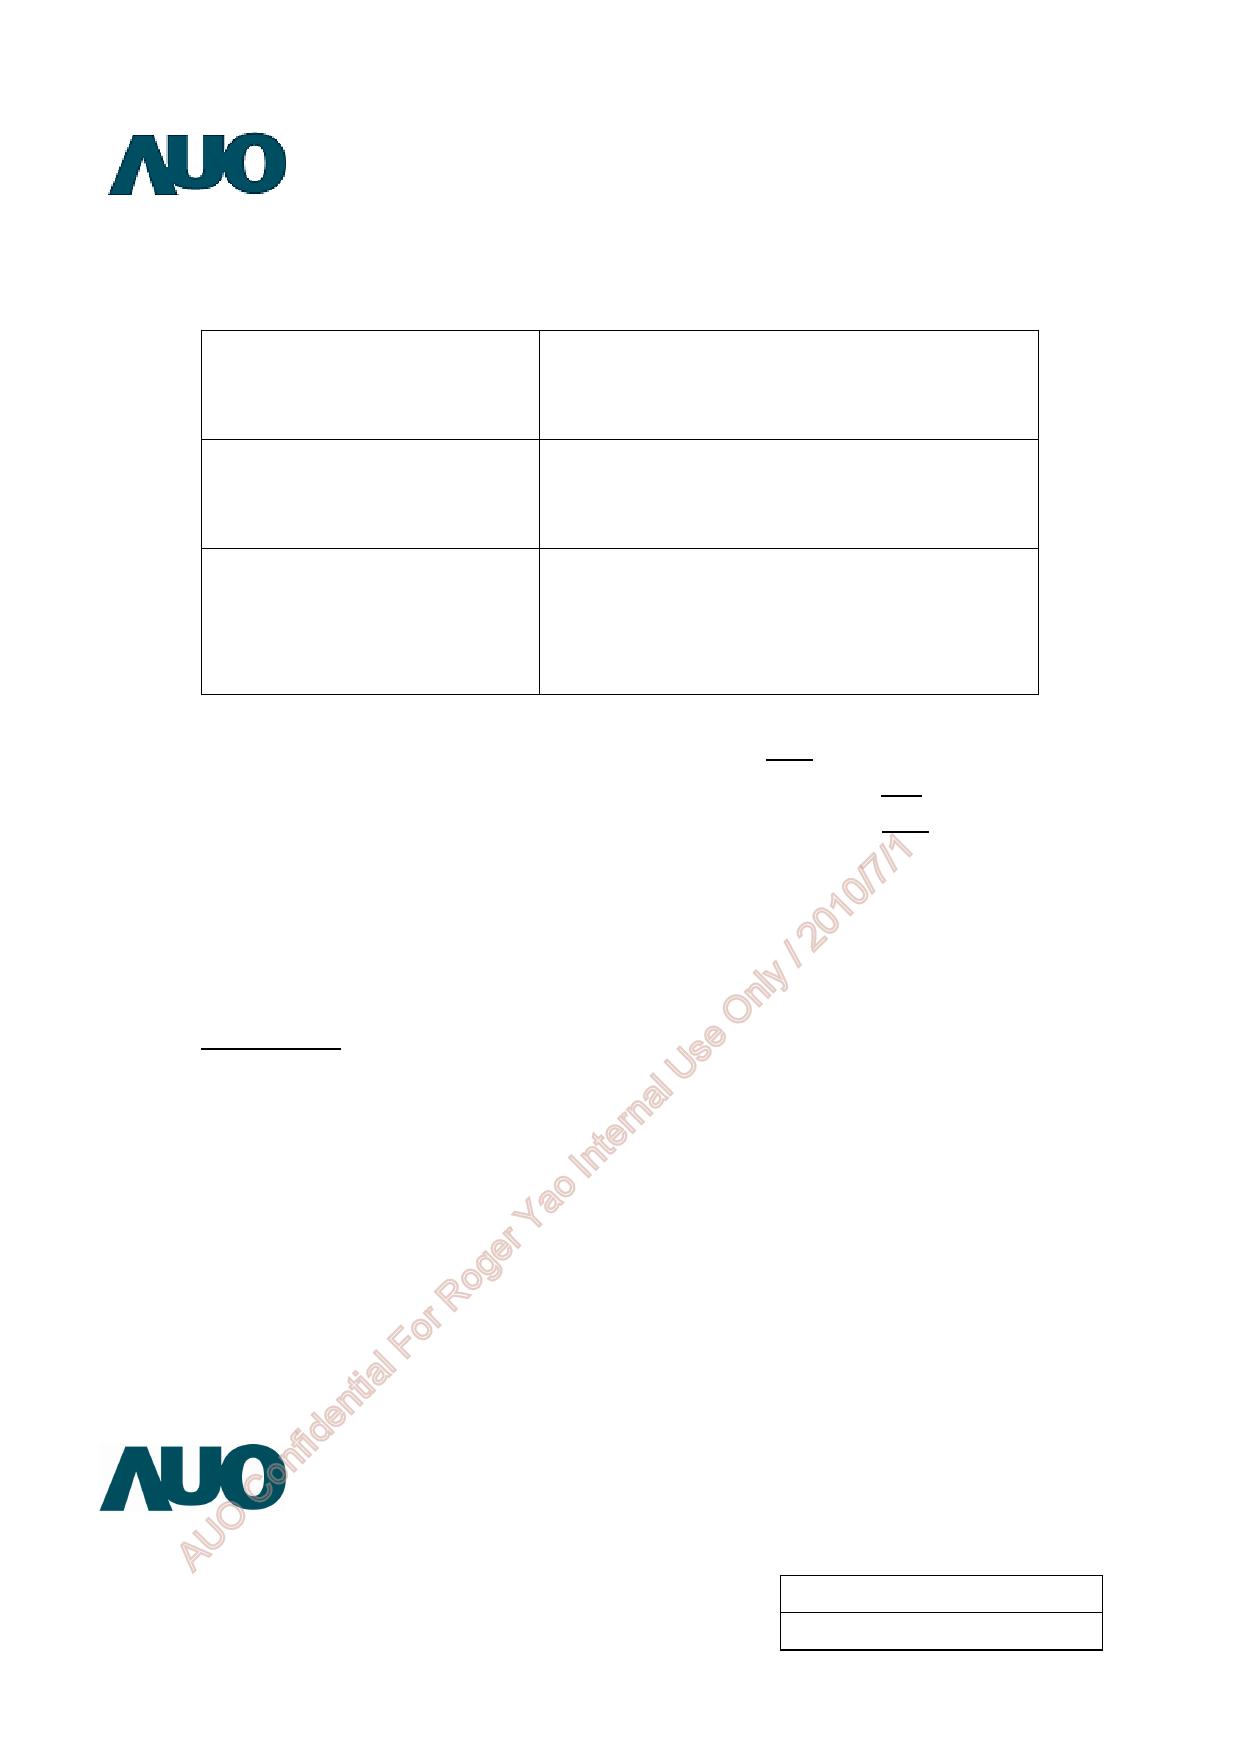 A070VW08-V0 datasheet, circuit